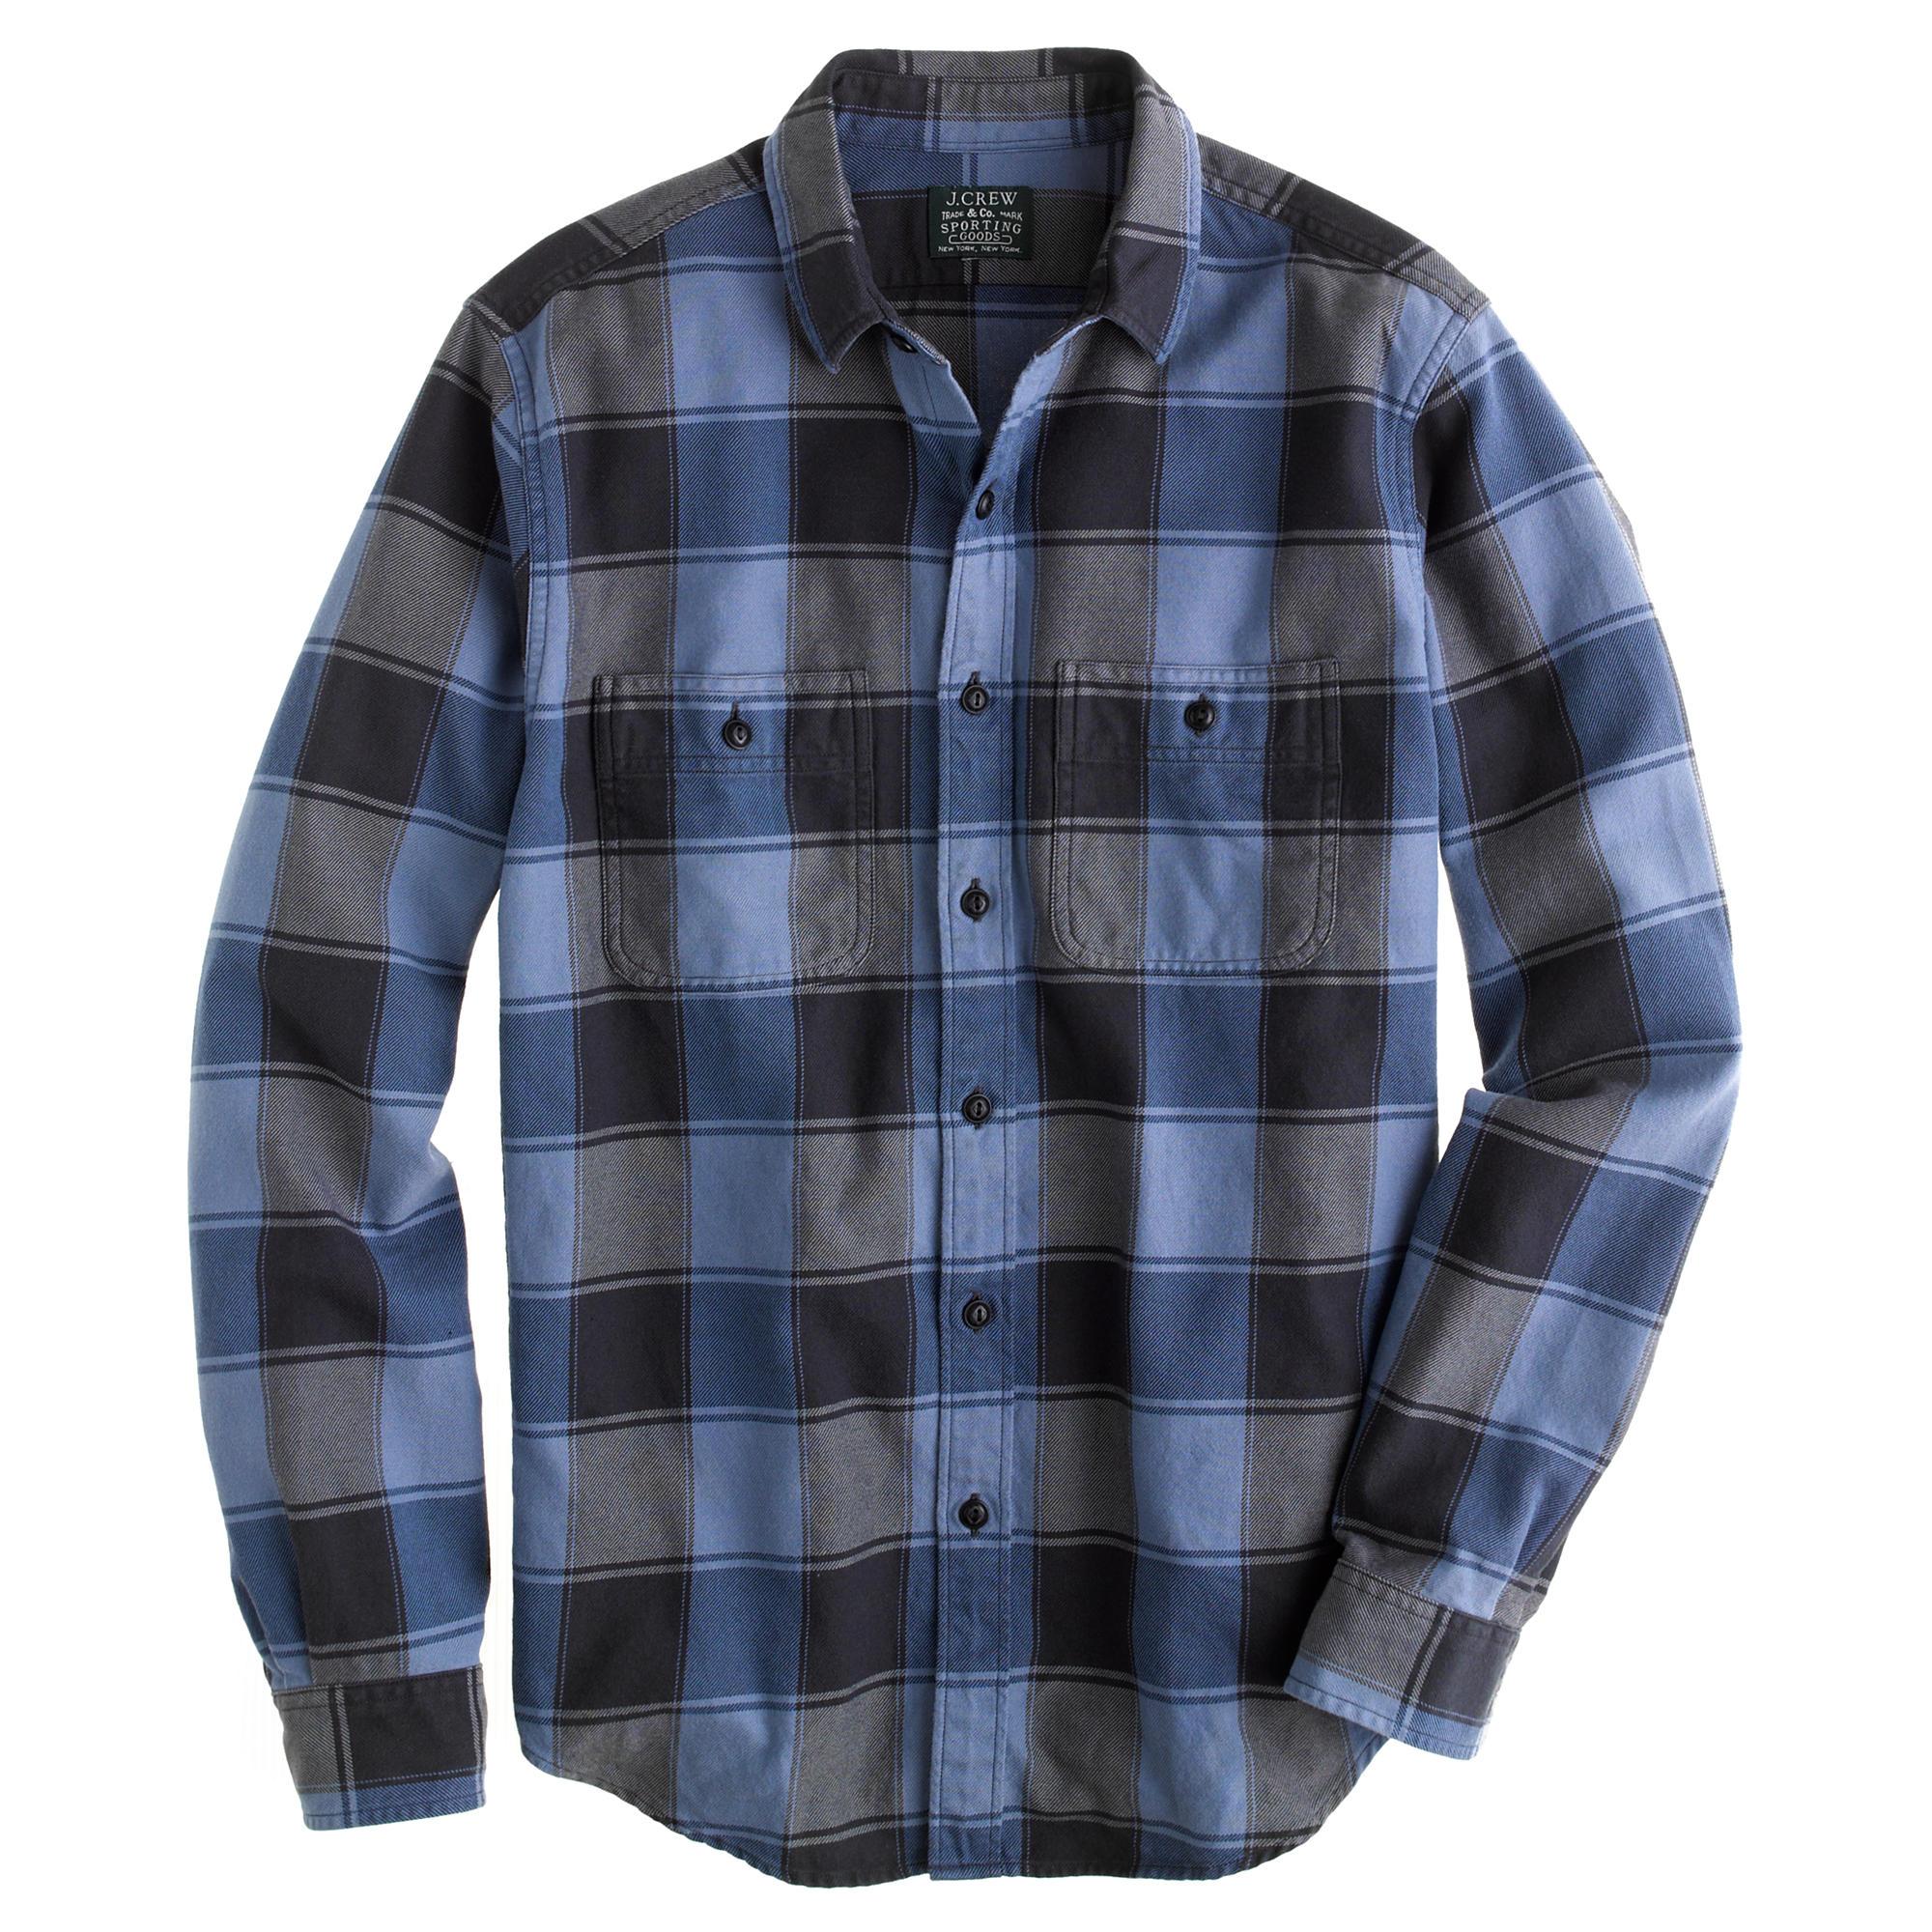 flannel shirt in cambridge blue plaid j crew